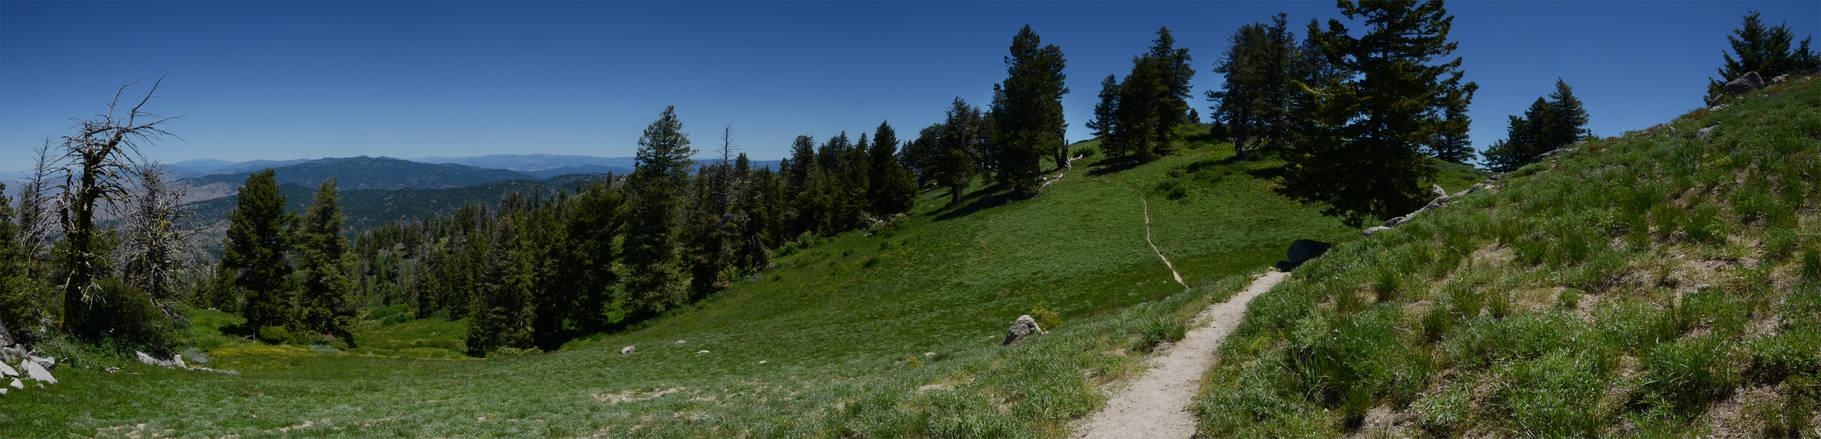 Shafer Butte Hike